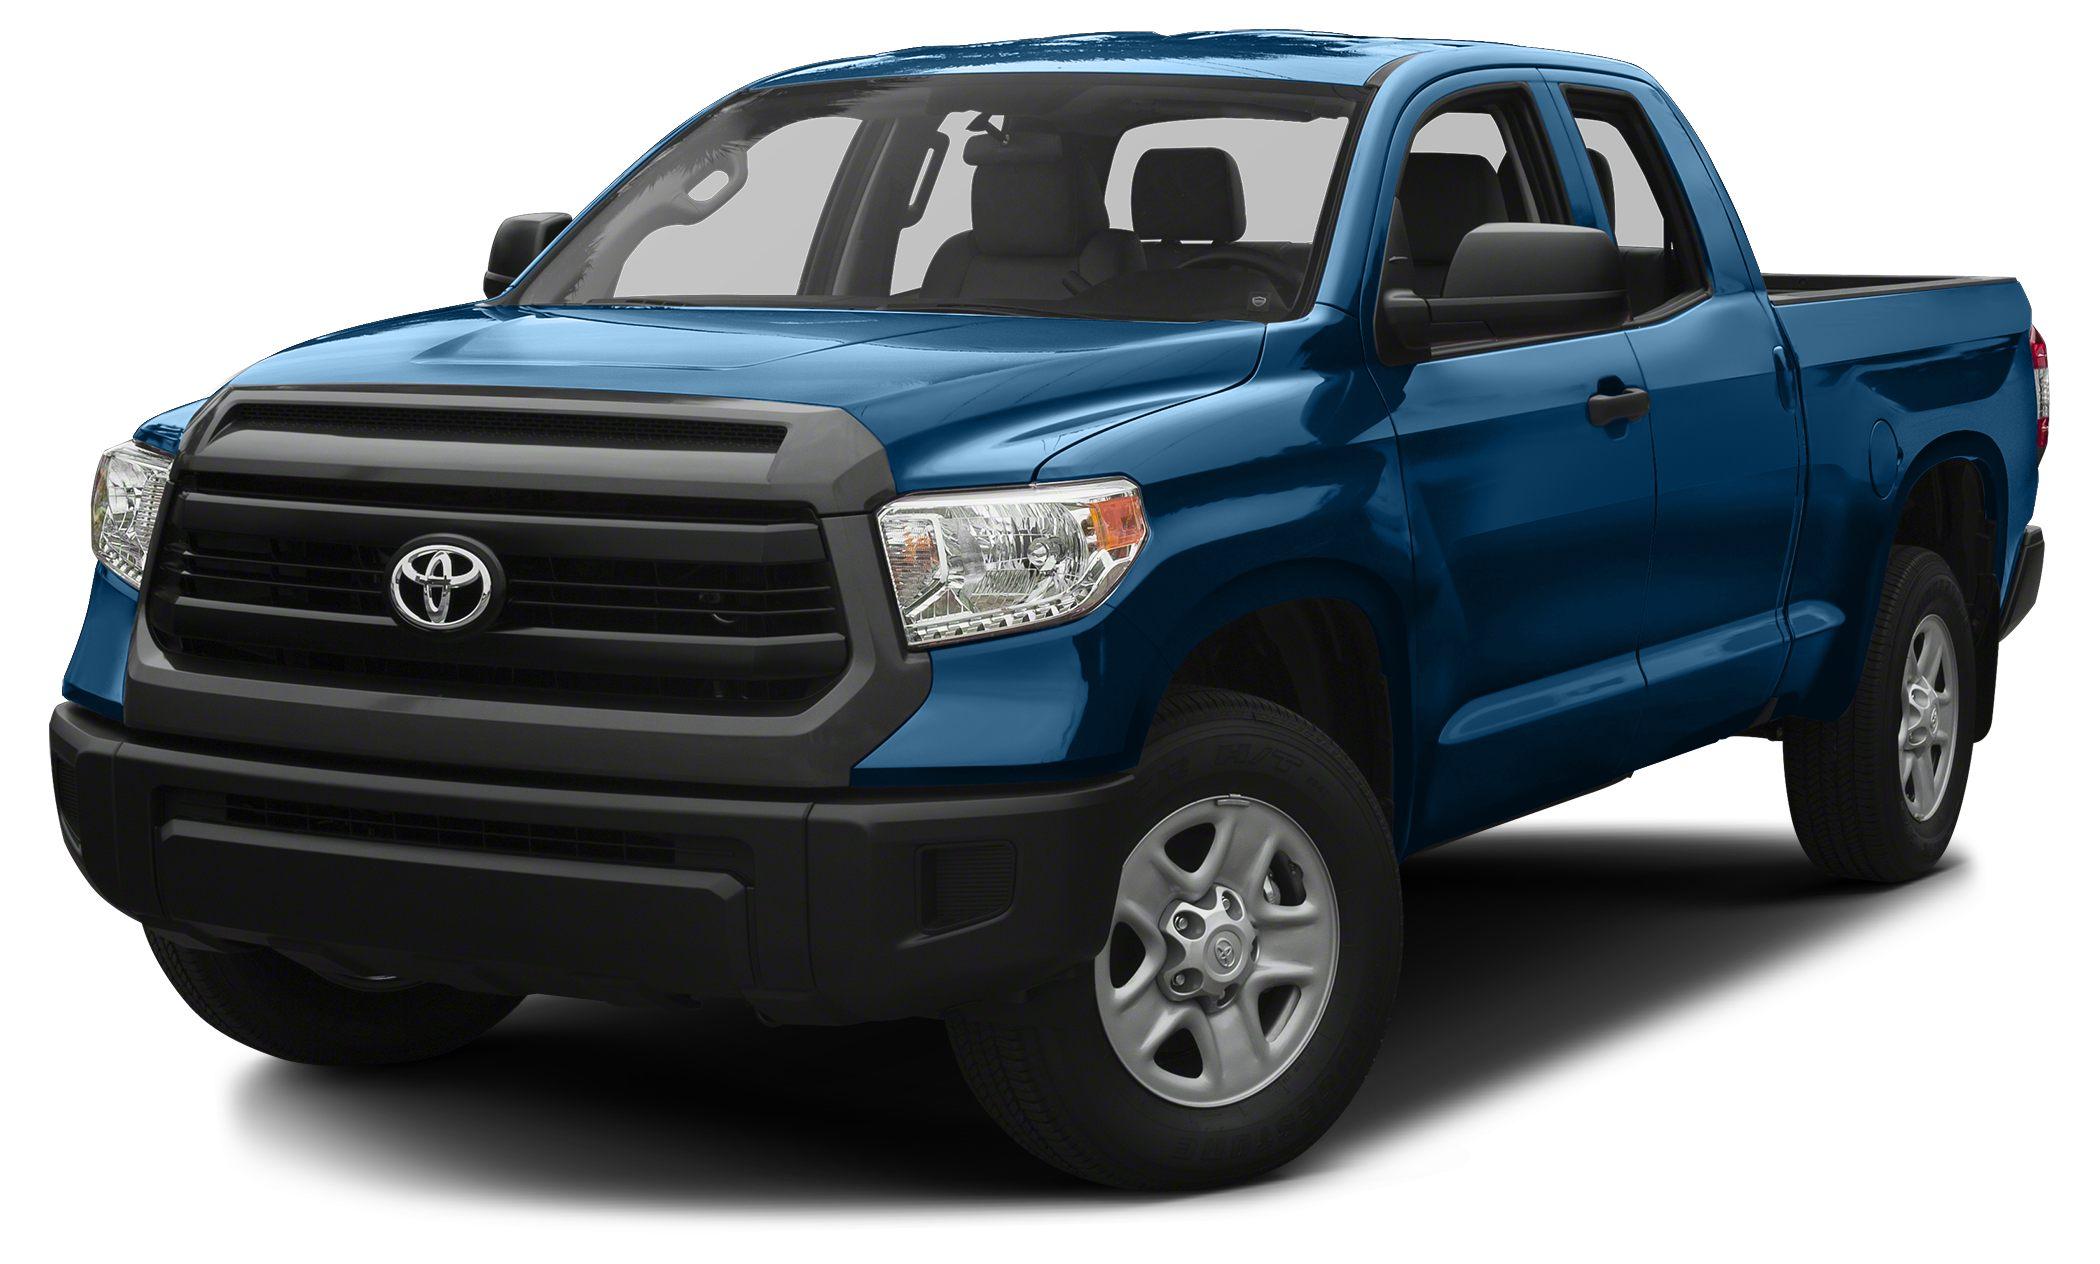 2016 Toyota Tundra SR5 BLAZING BLUE PEARL exterior and GRAPHITE interior SR5 trim iPodMP3 Input